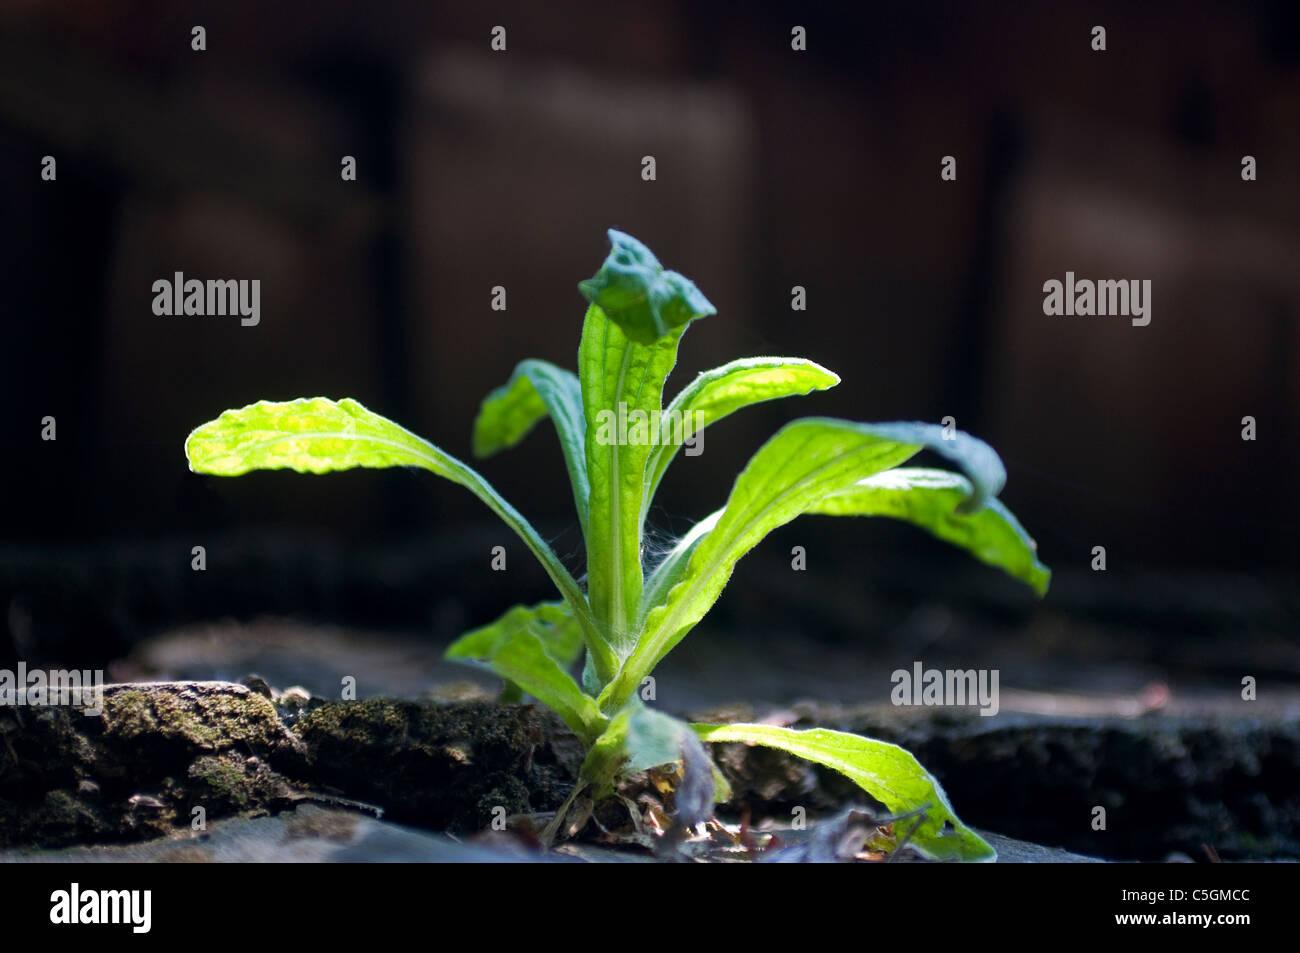 Plant seedling - Stock Image